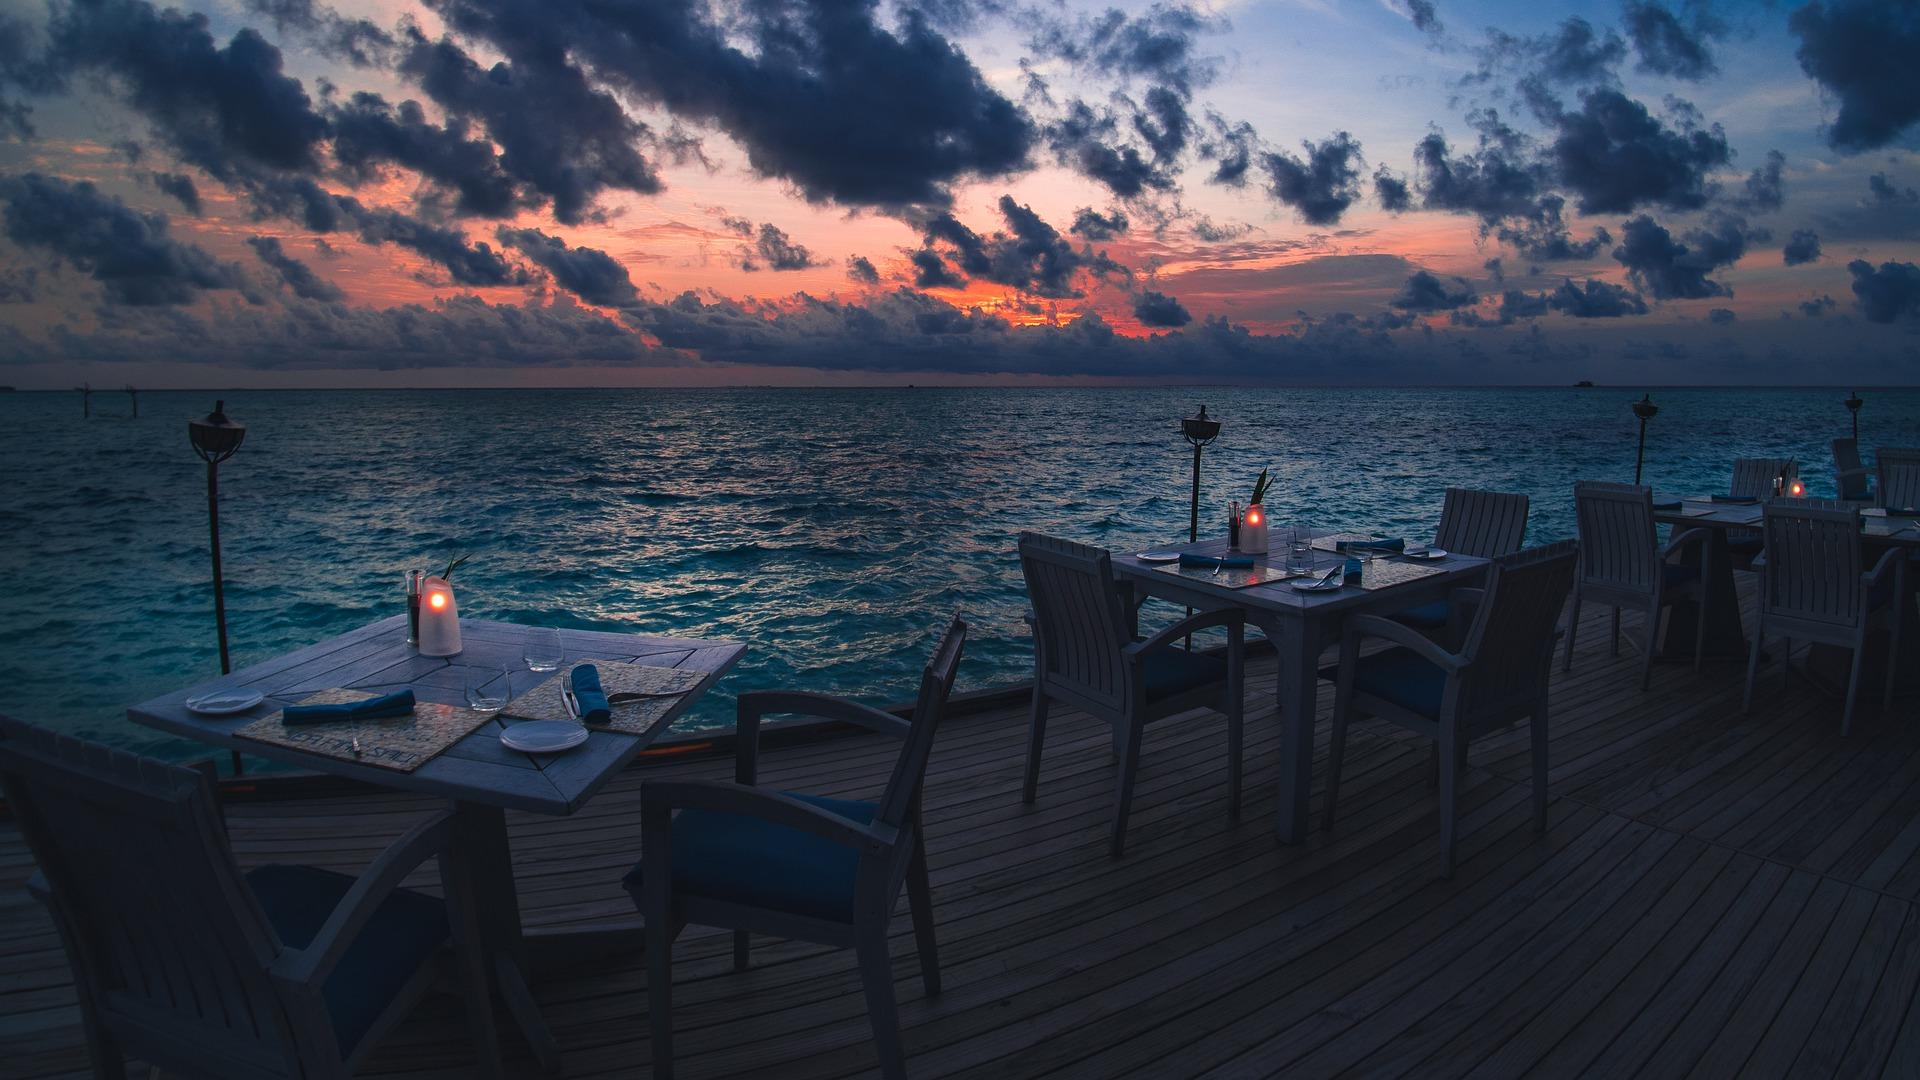 9 Things Every Honeymooner Needs To Know